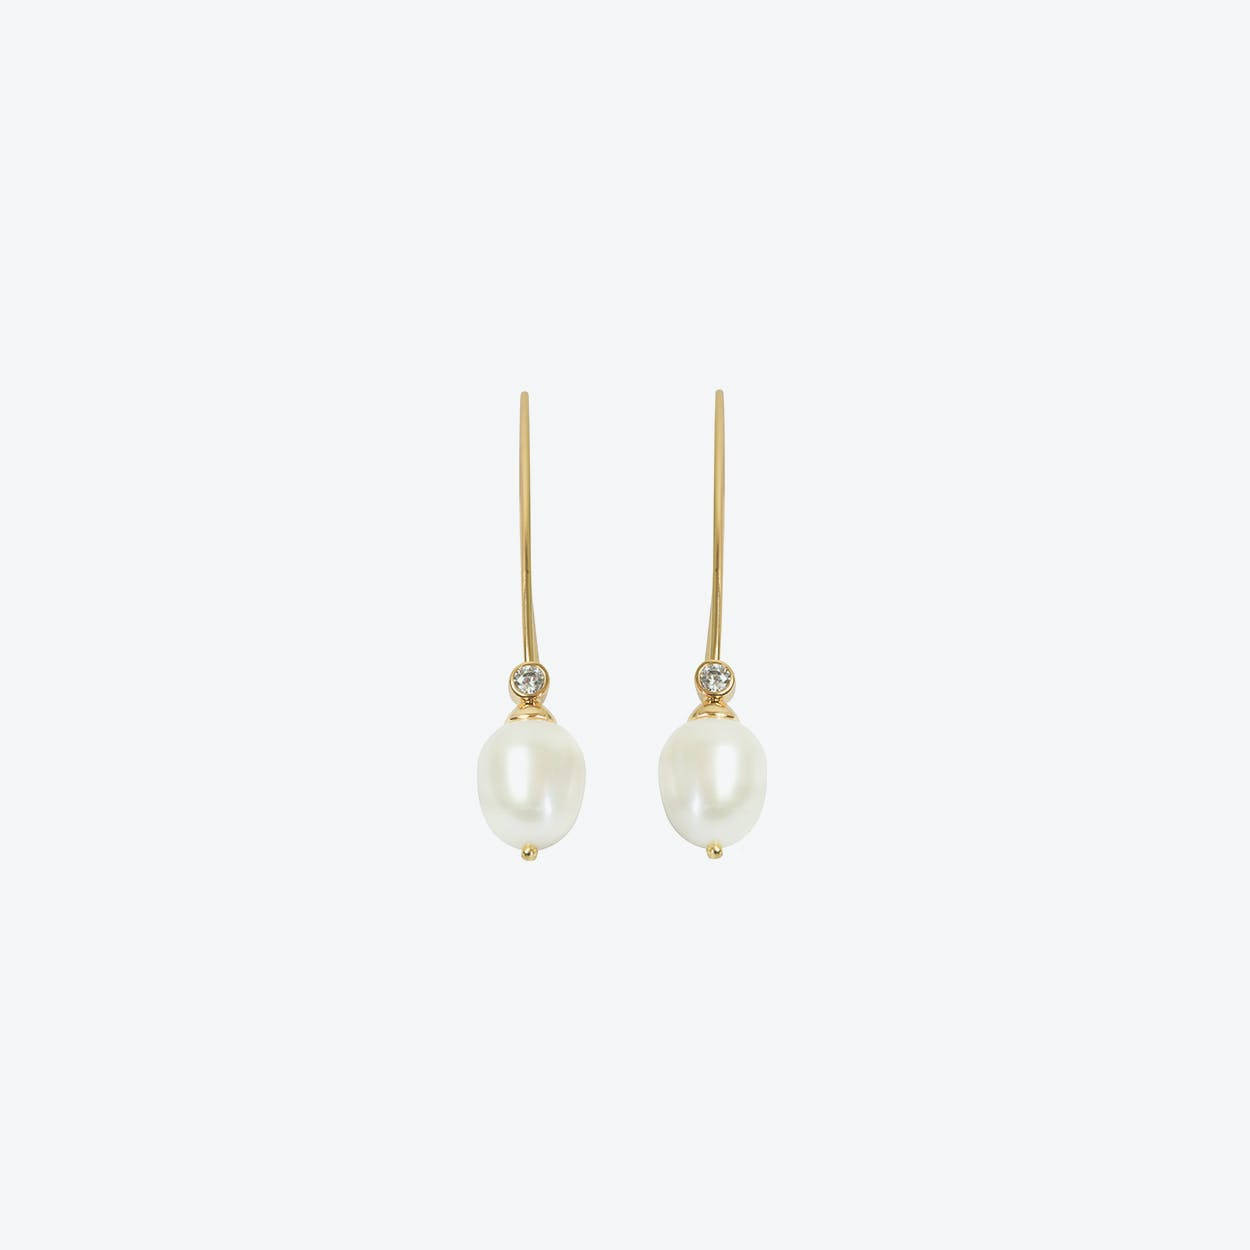 18k Gold Cultured Pearl Long Drop Earring